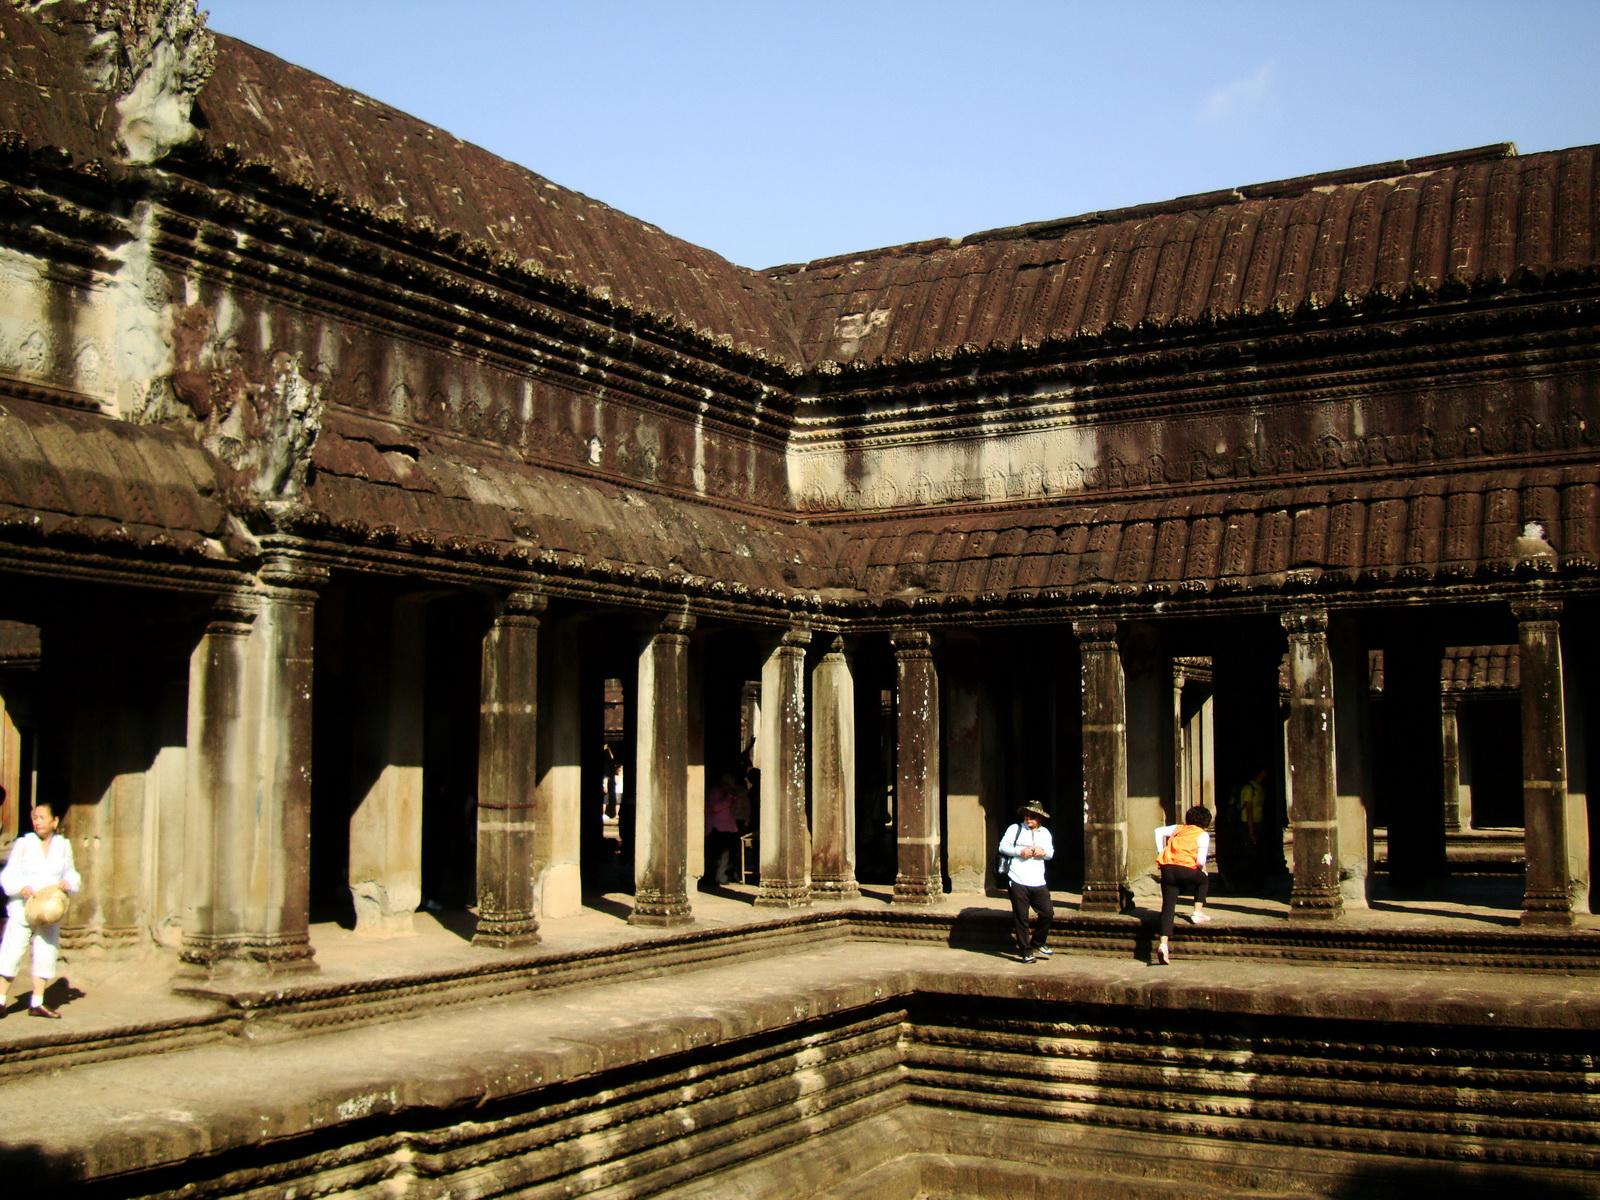 Angkor Wat inner sanctuary gallery columns and passageways 15